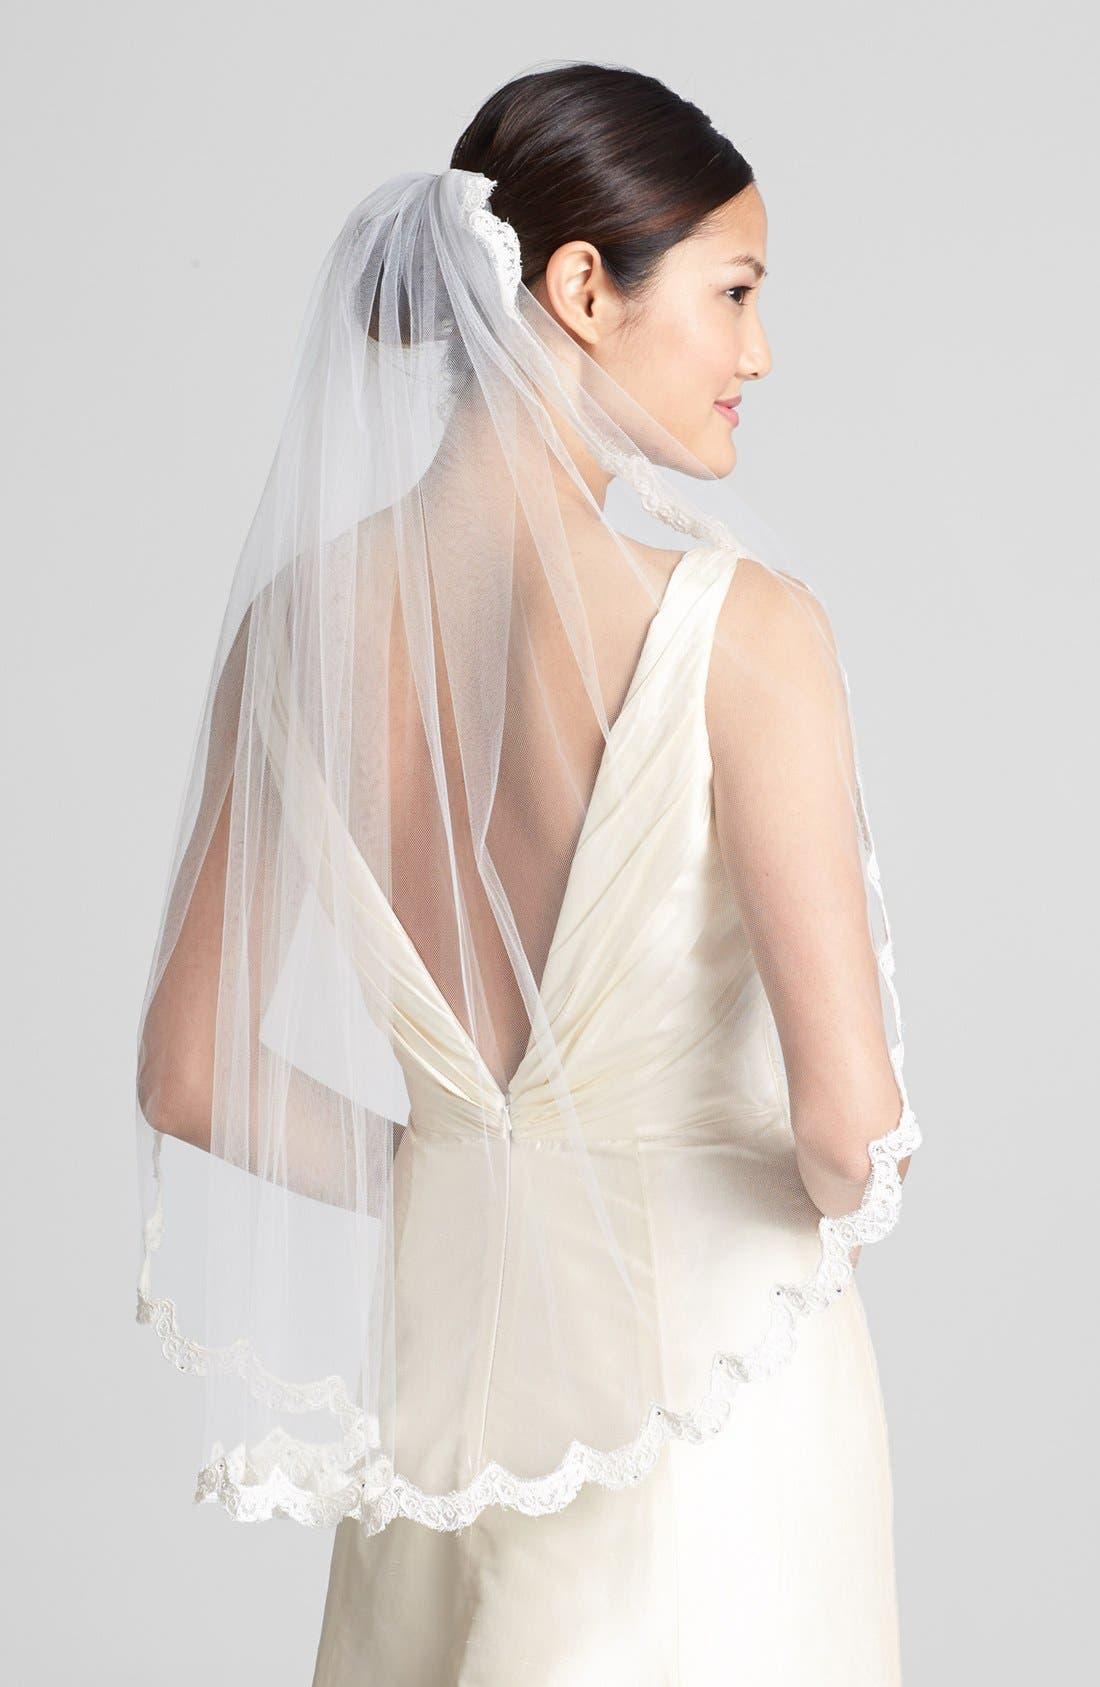 Wedding Belles New York 'Lola - Swarovski Crystal' Lace Border Veil (Nordstrom Exclusive)